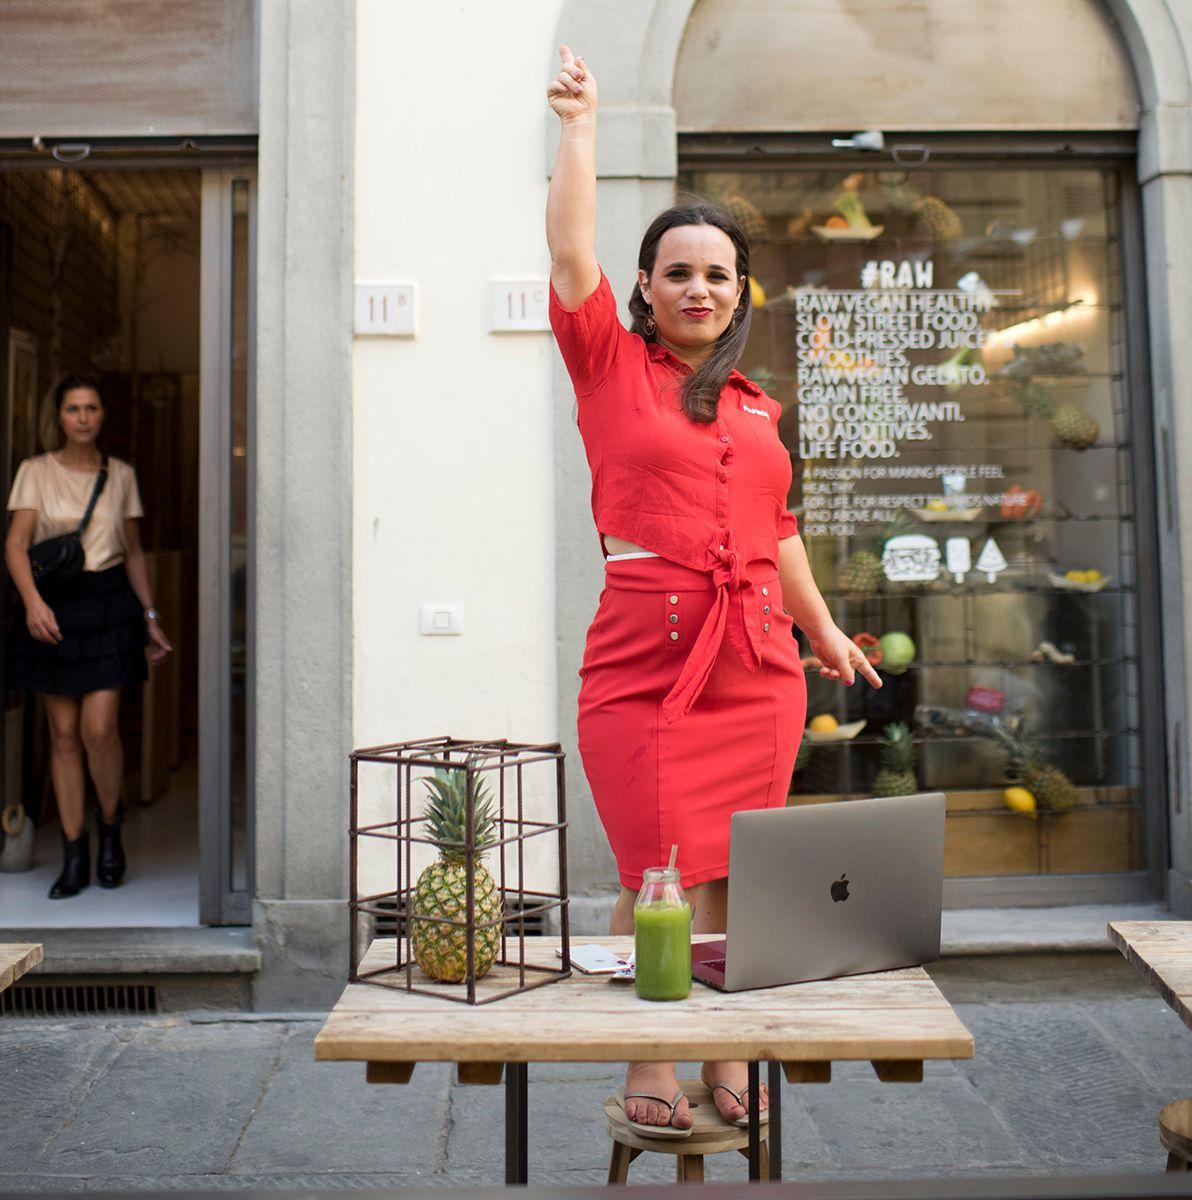 Simone Levie Meer Diepgang in je business blog inspiratie